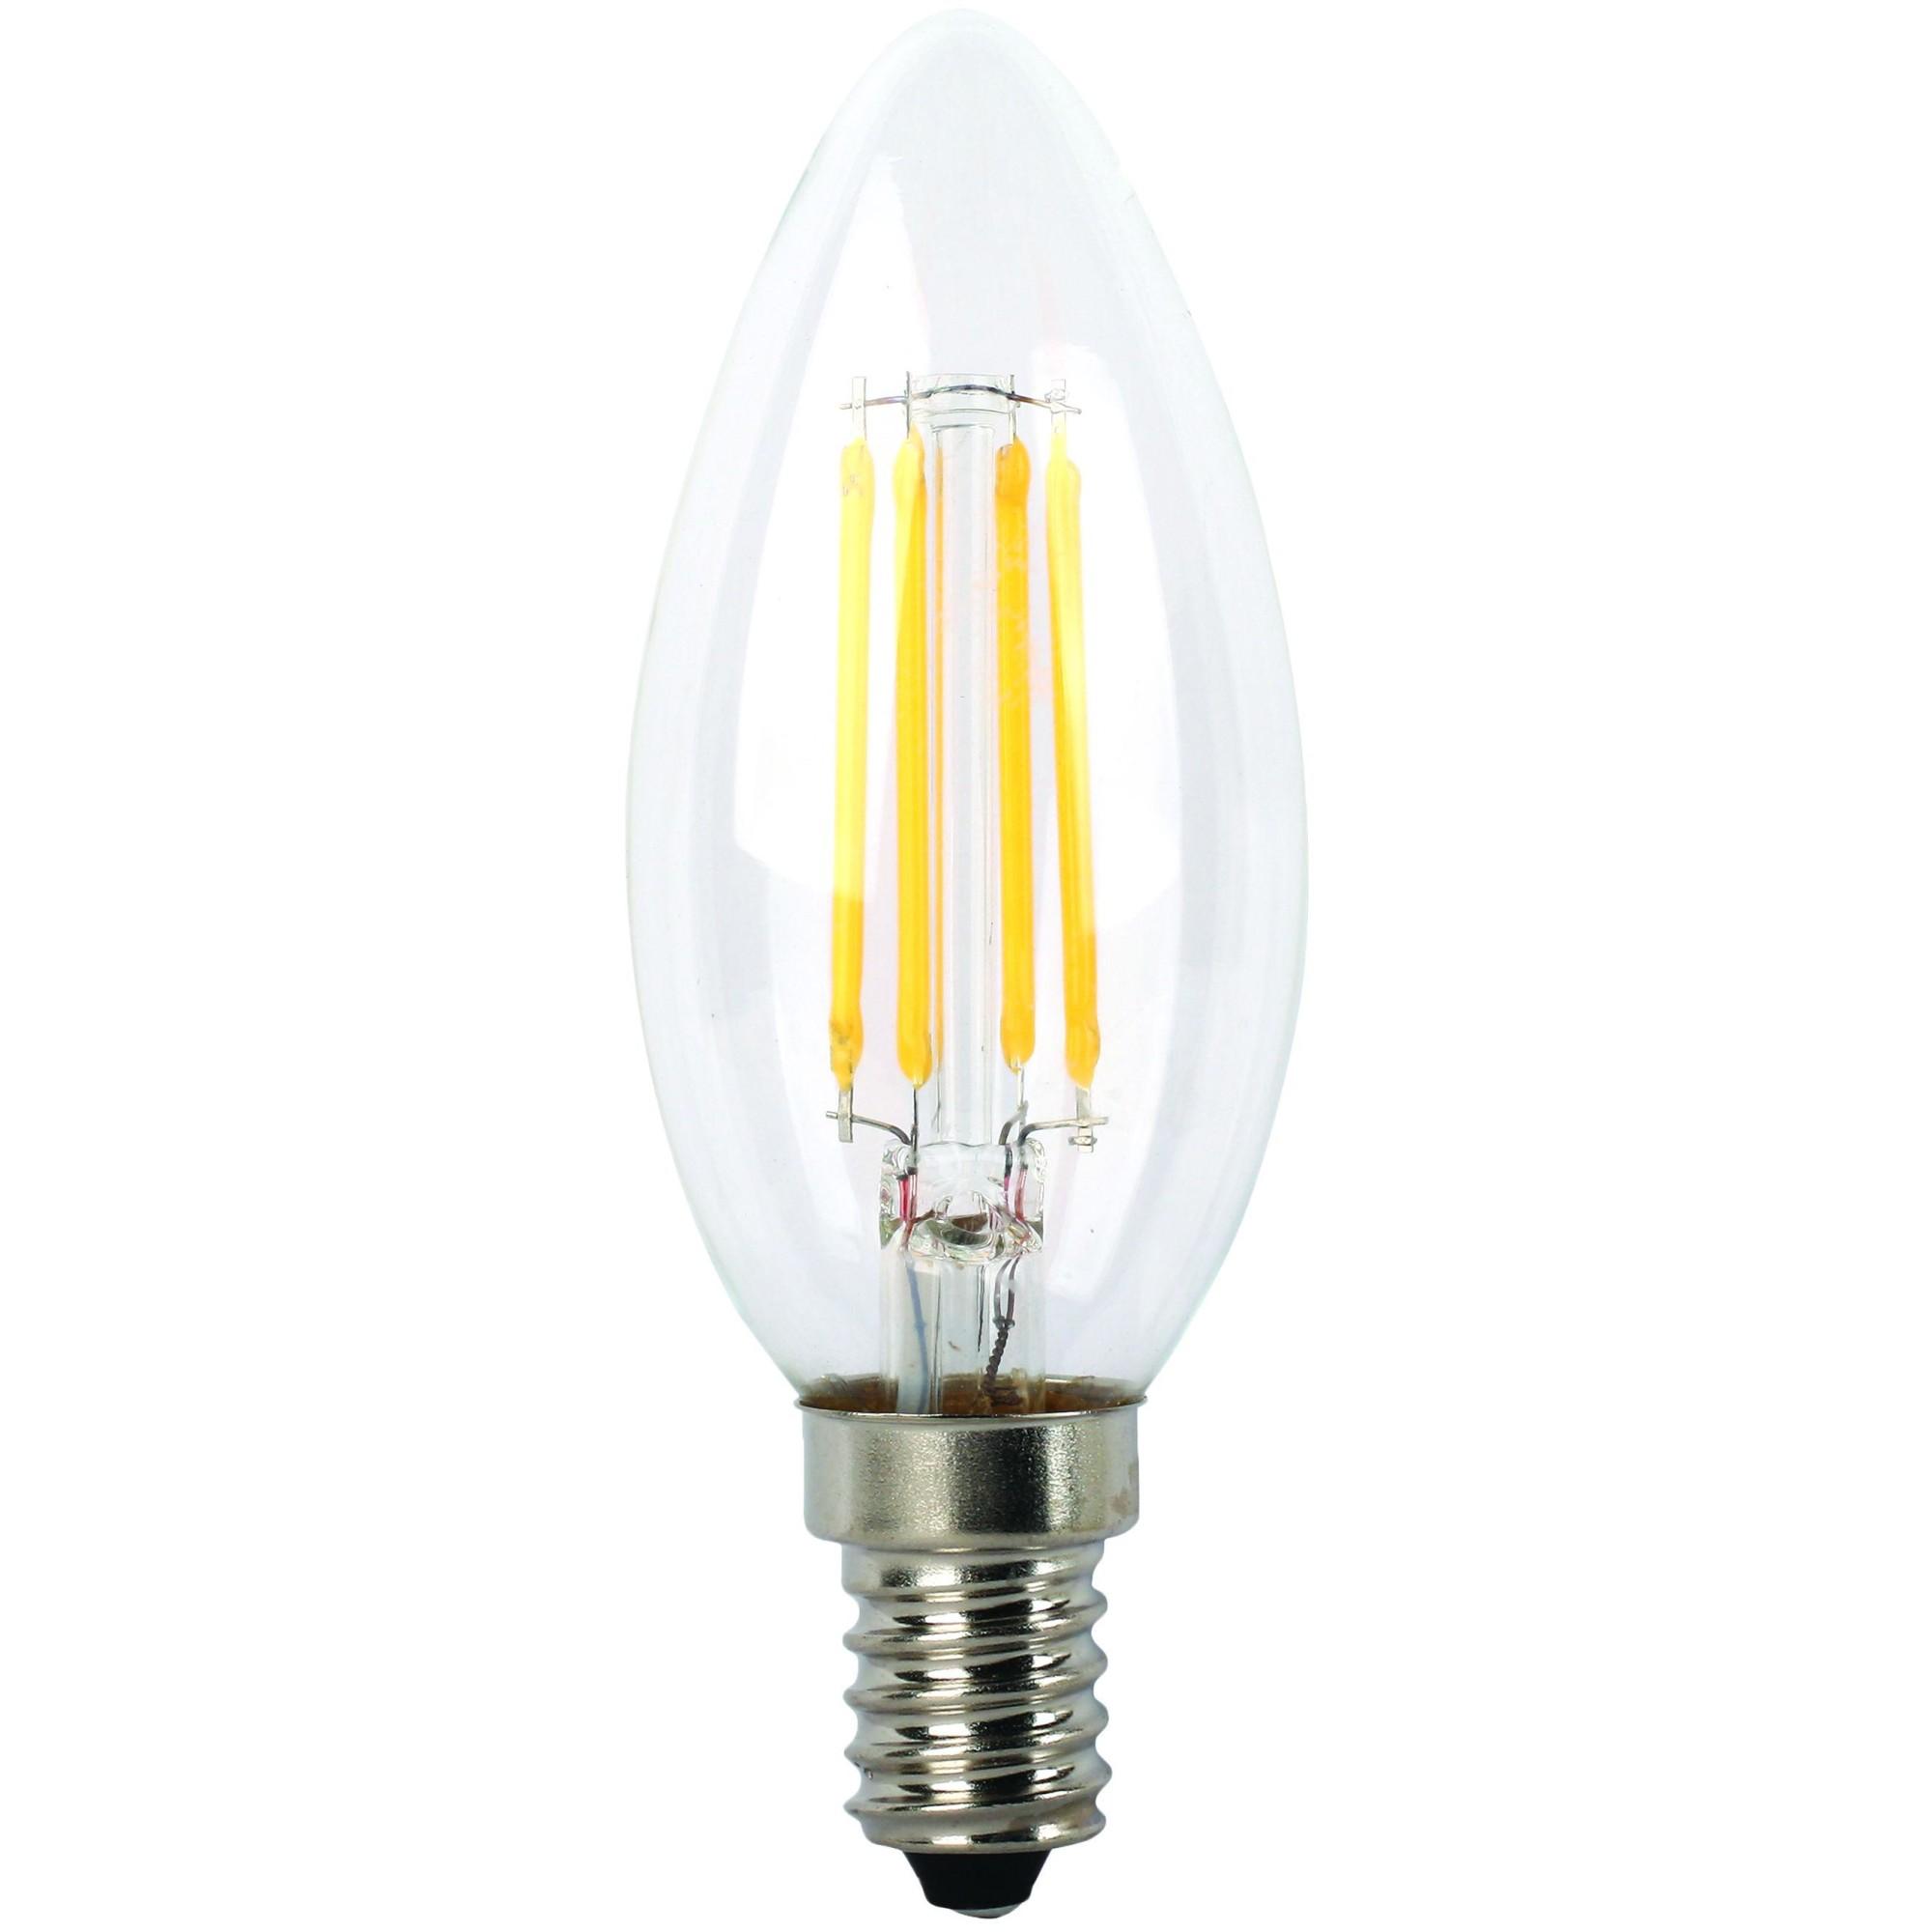 Лампа Ecola Premium светодионая E14 5 Вт свеча 500 Лм теплый свет